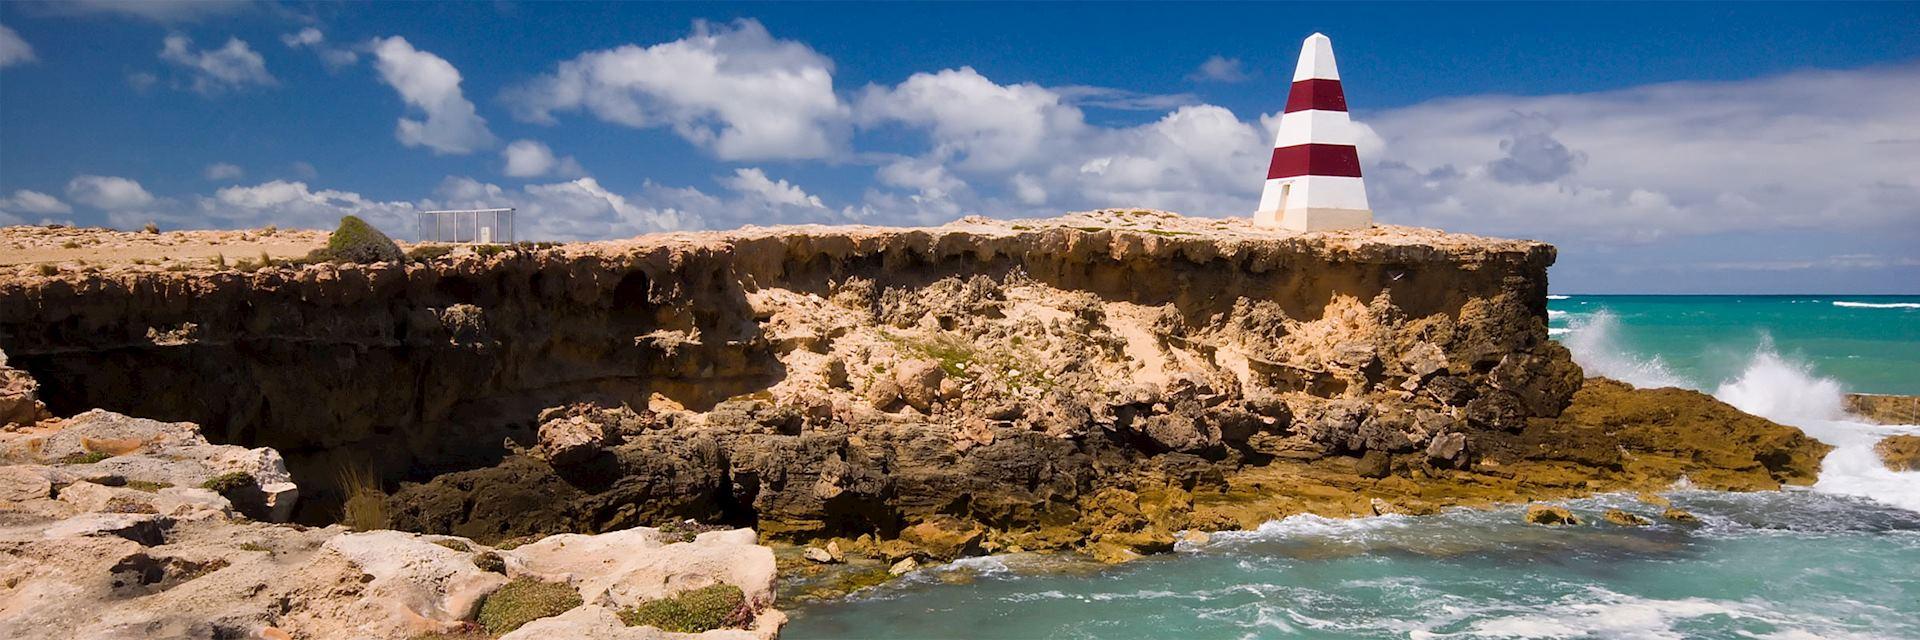 Robe coastline